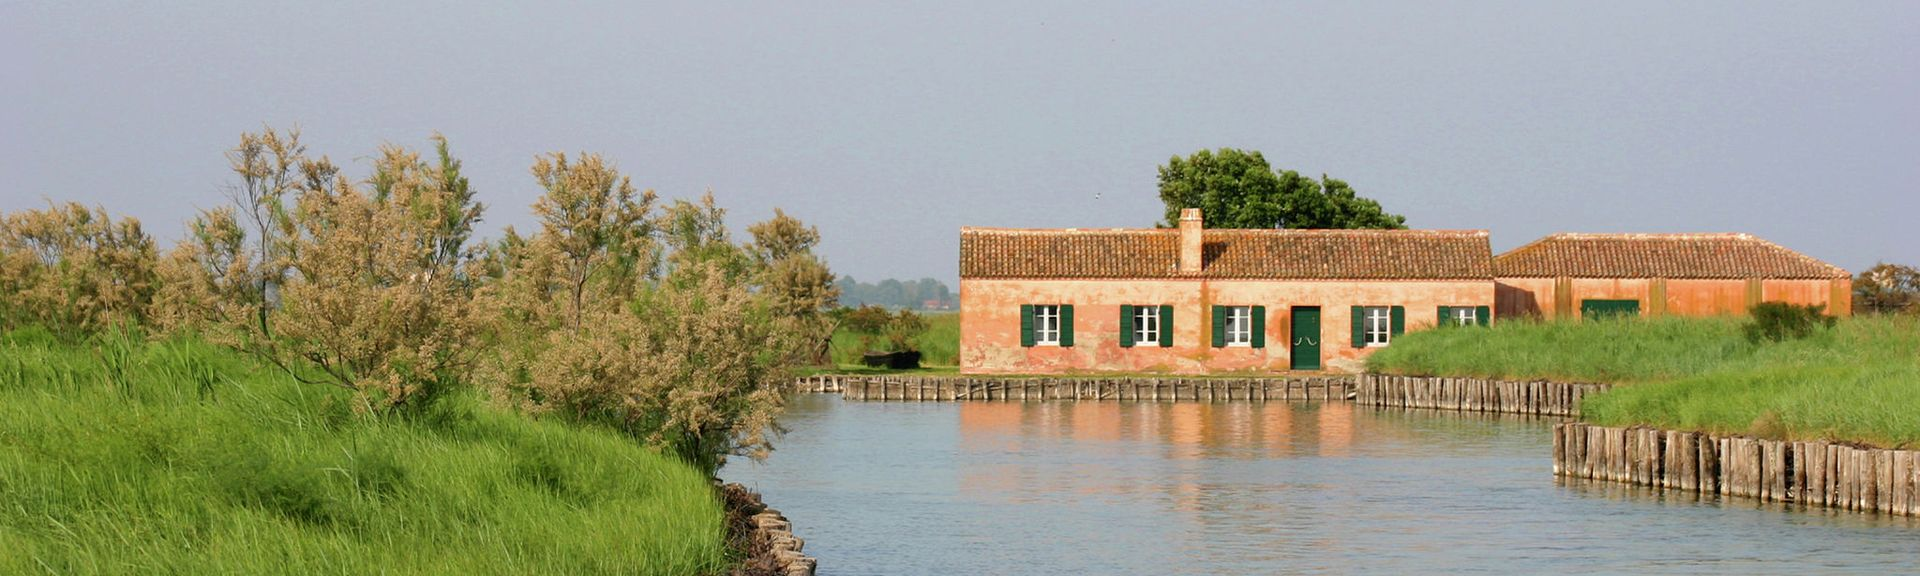 Province of Ravenna, Italy